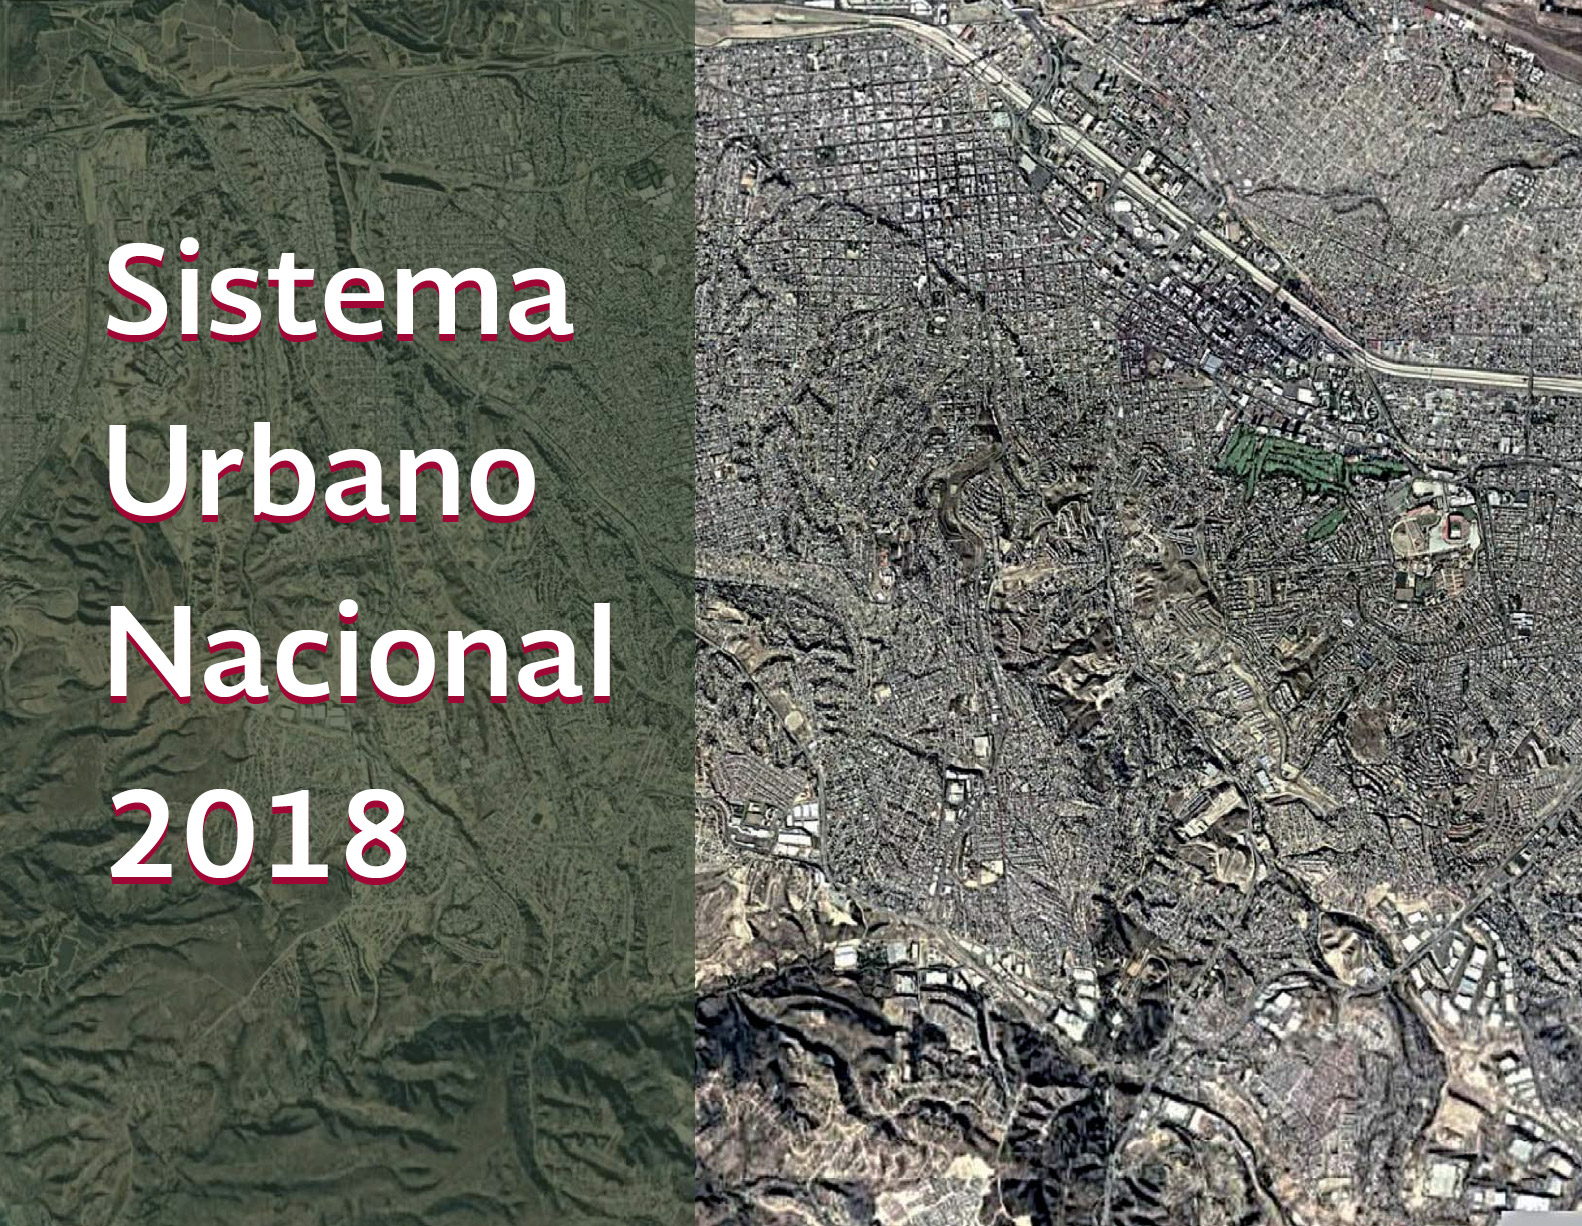 Sistema Urbano Nacional 2018